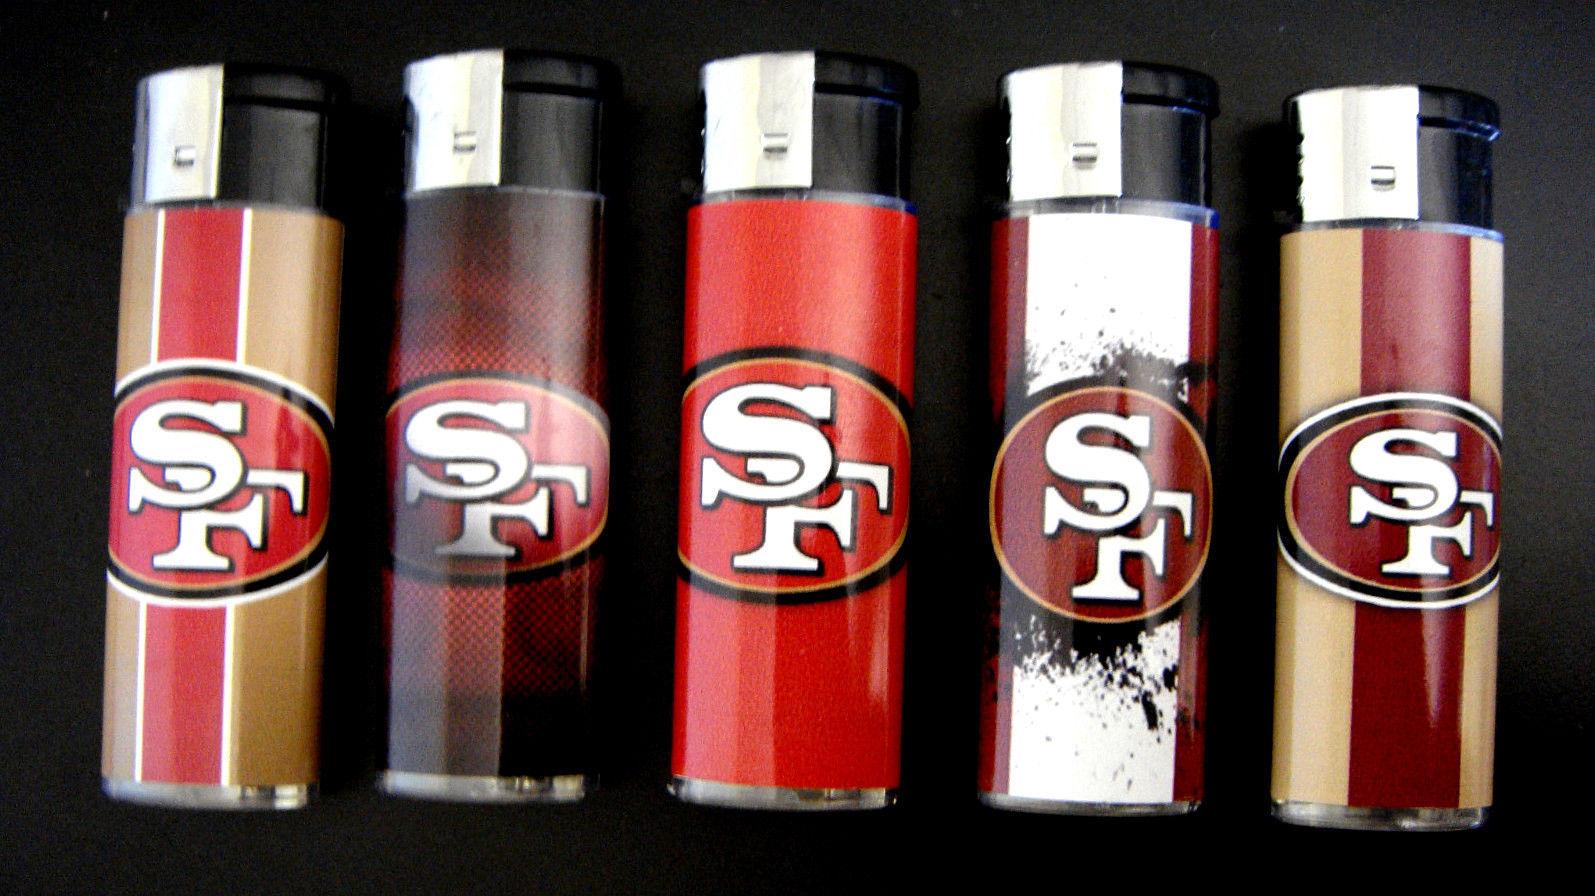 San Francisco 49ers Football LogoTheme Set of 5 Cigarette Lighters